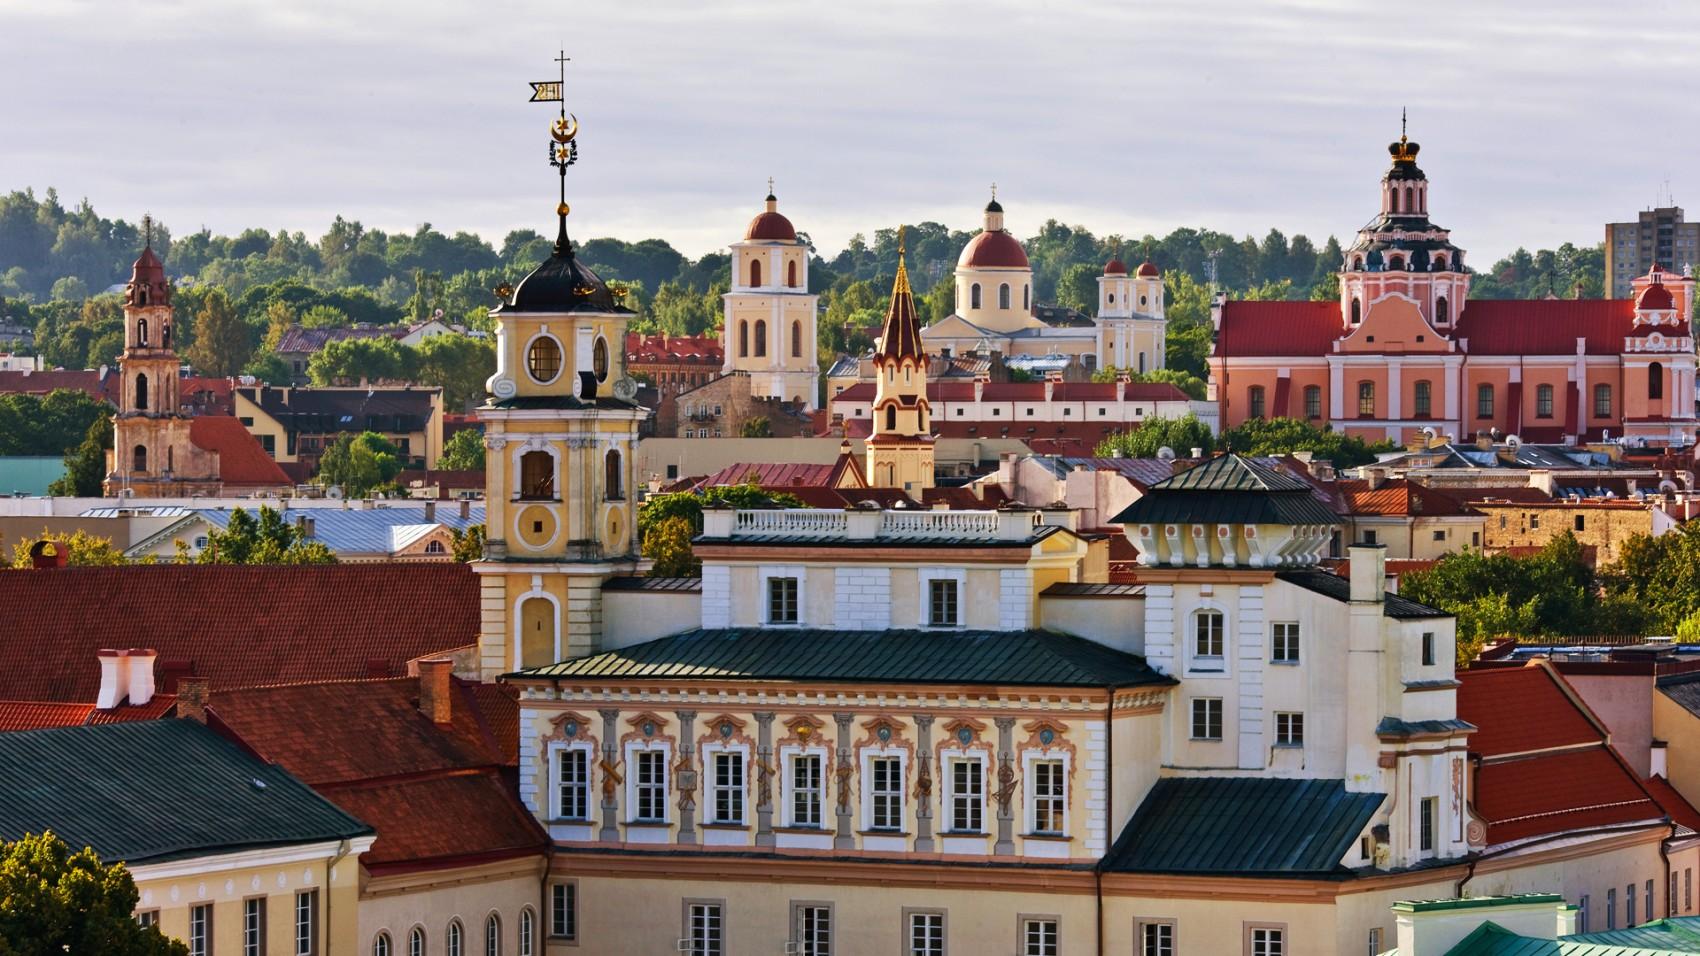 Вильнюс Cтарый город (источник:kempinski.com)